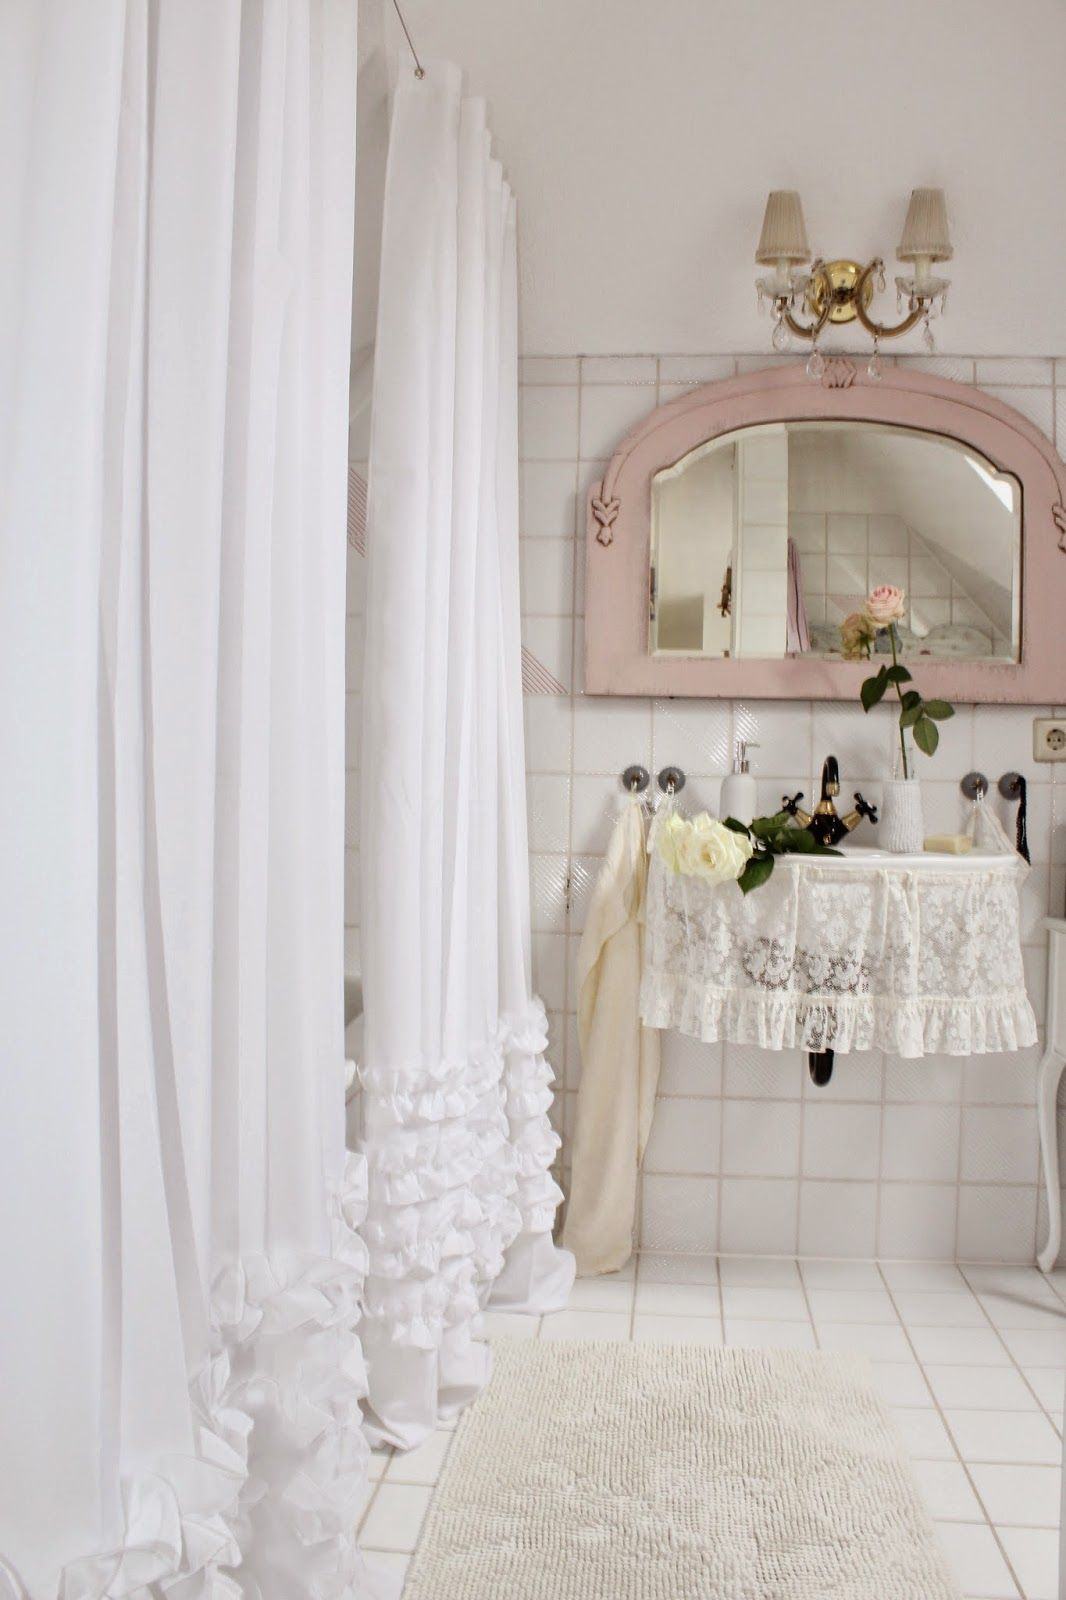 Shabby Chic Bathroom - | romantische bäder | Shabby chic ...